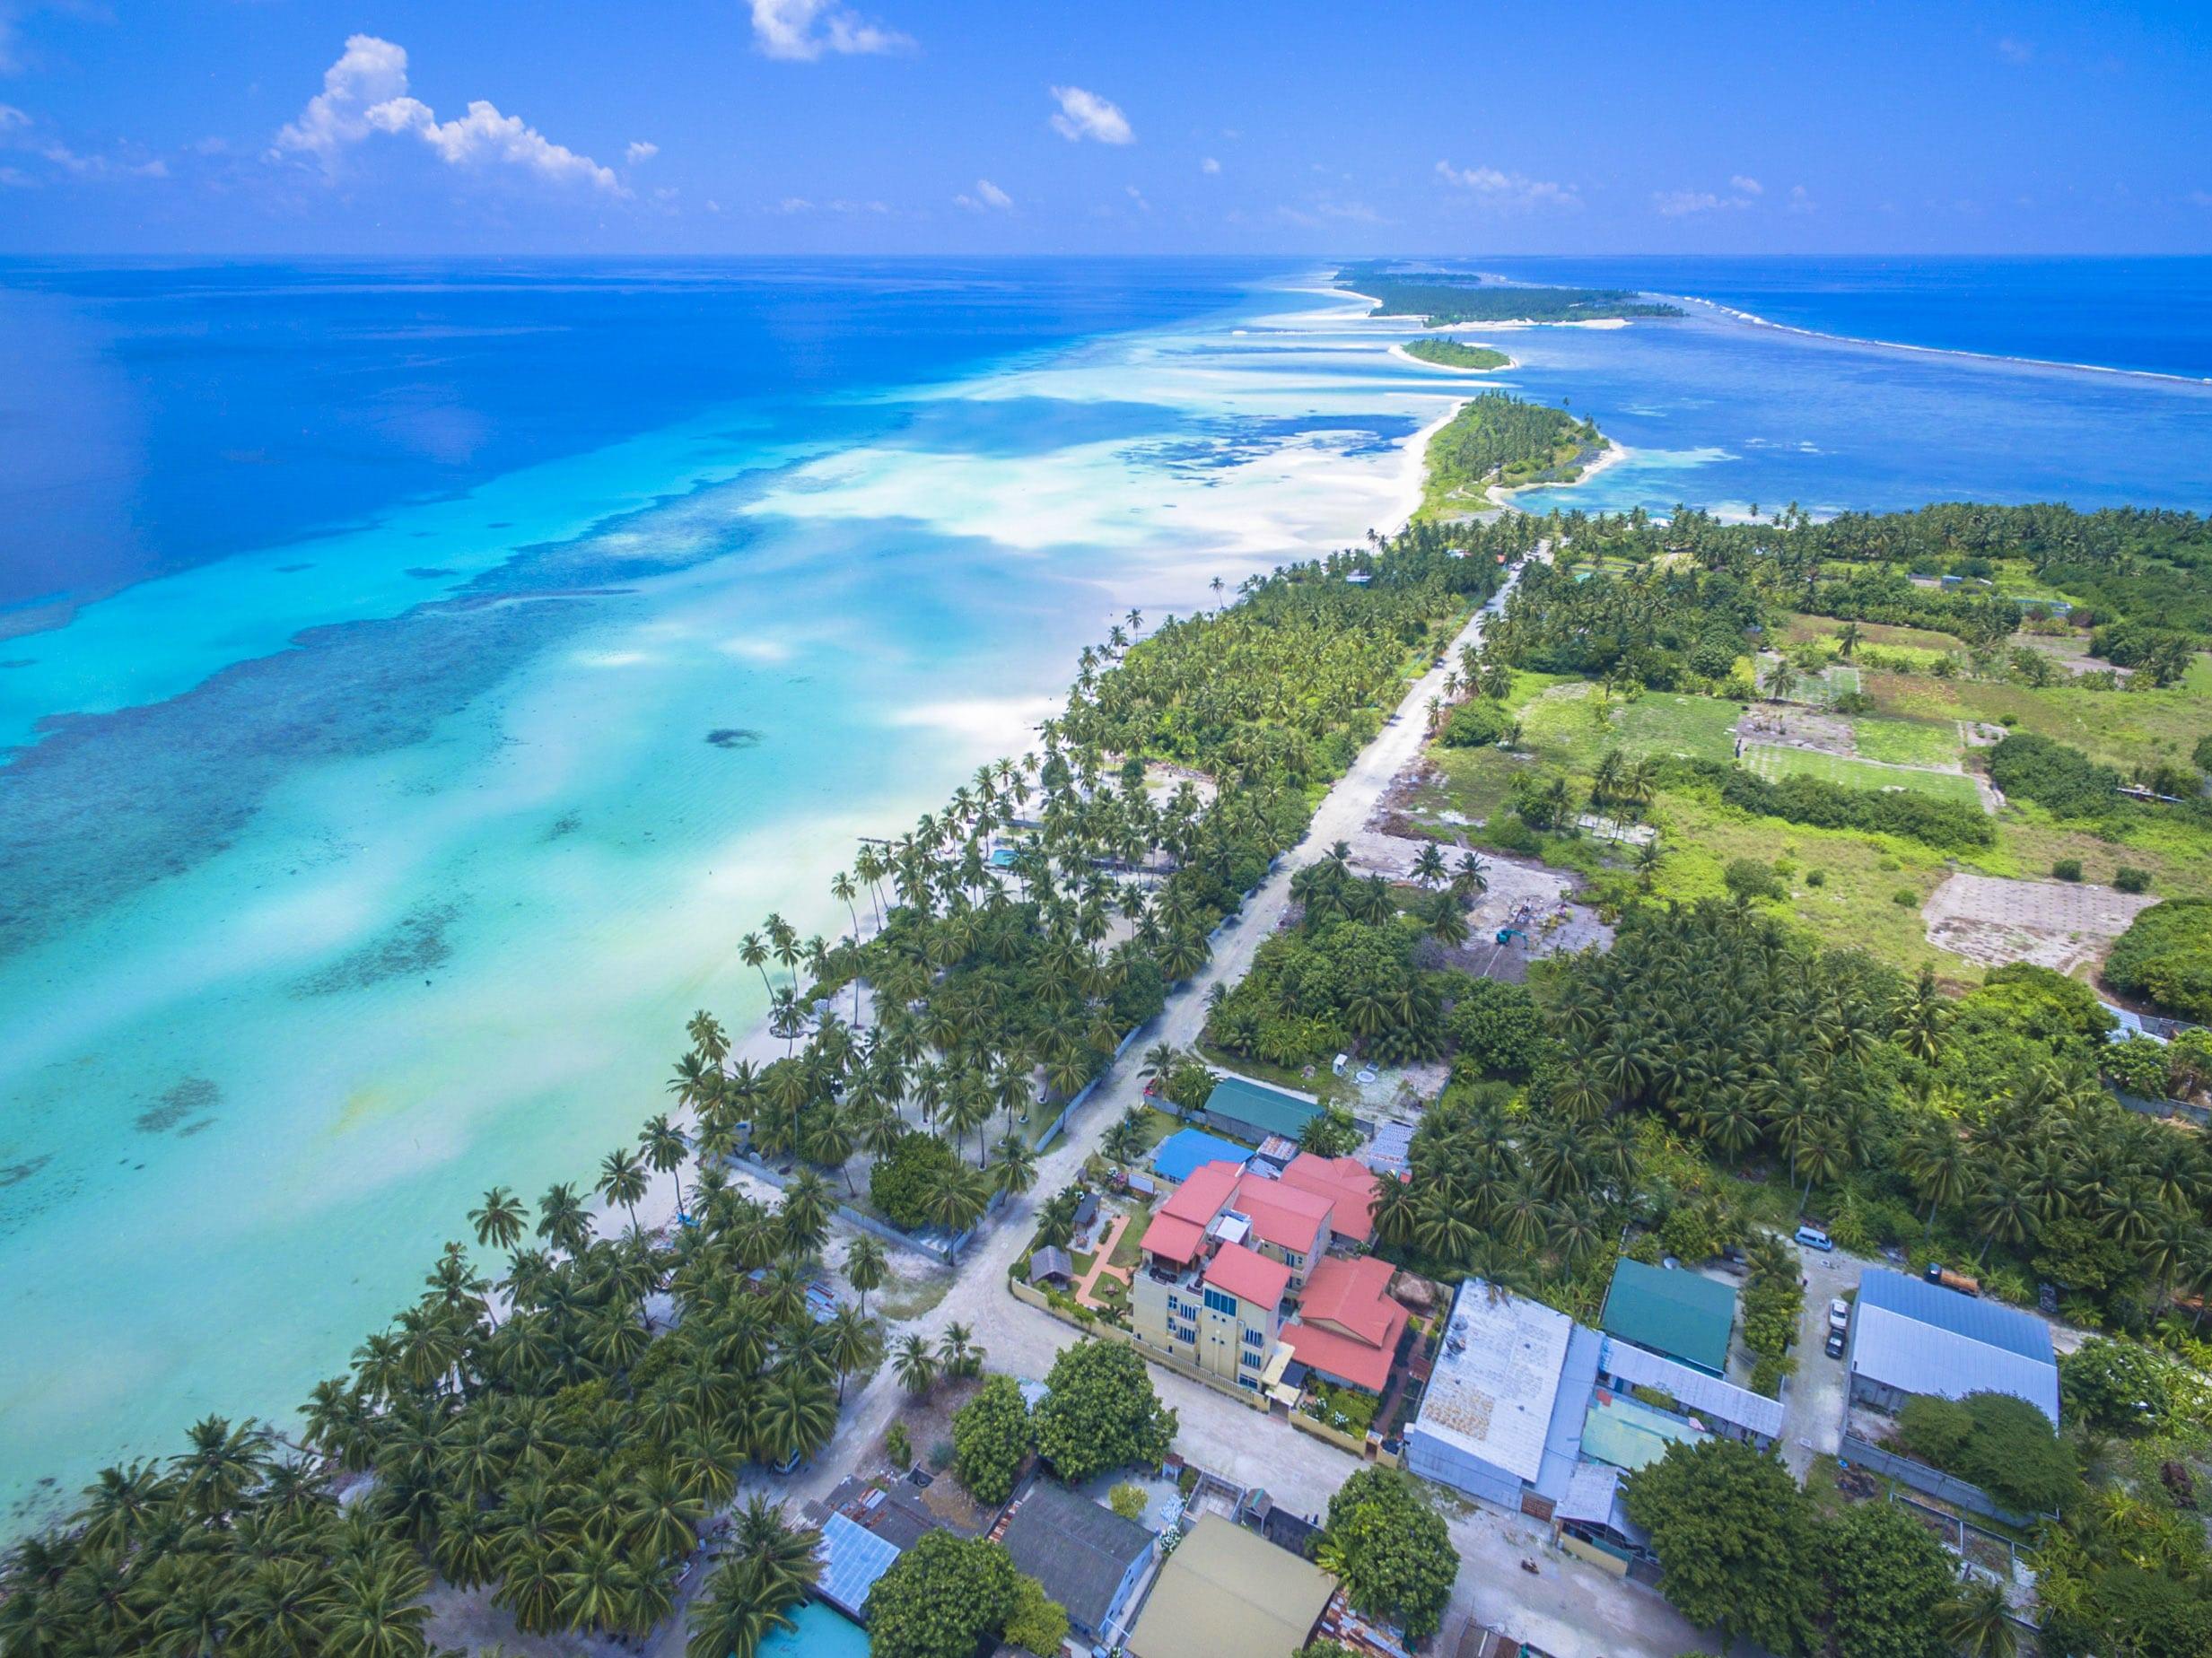 Emperor Maldives Opens First Dive Center On Gan, Laamu Atoll